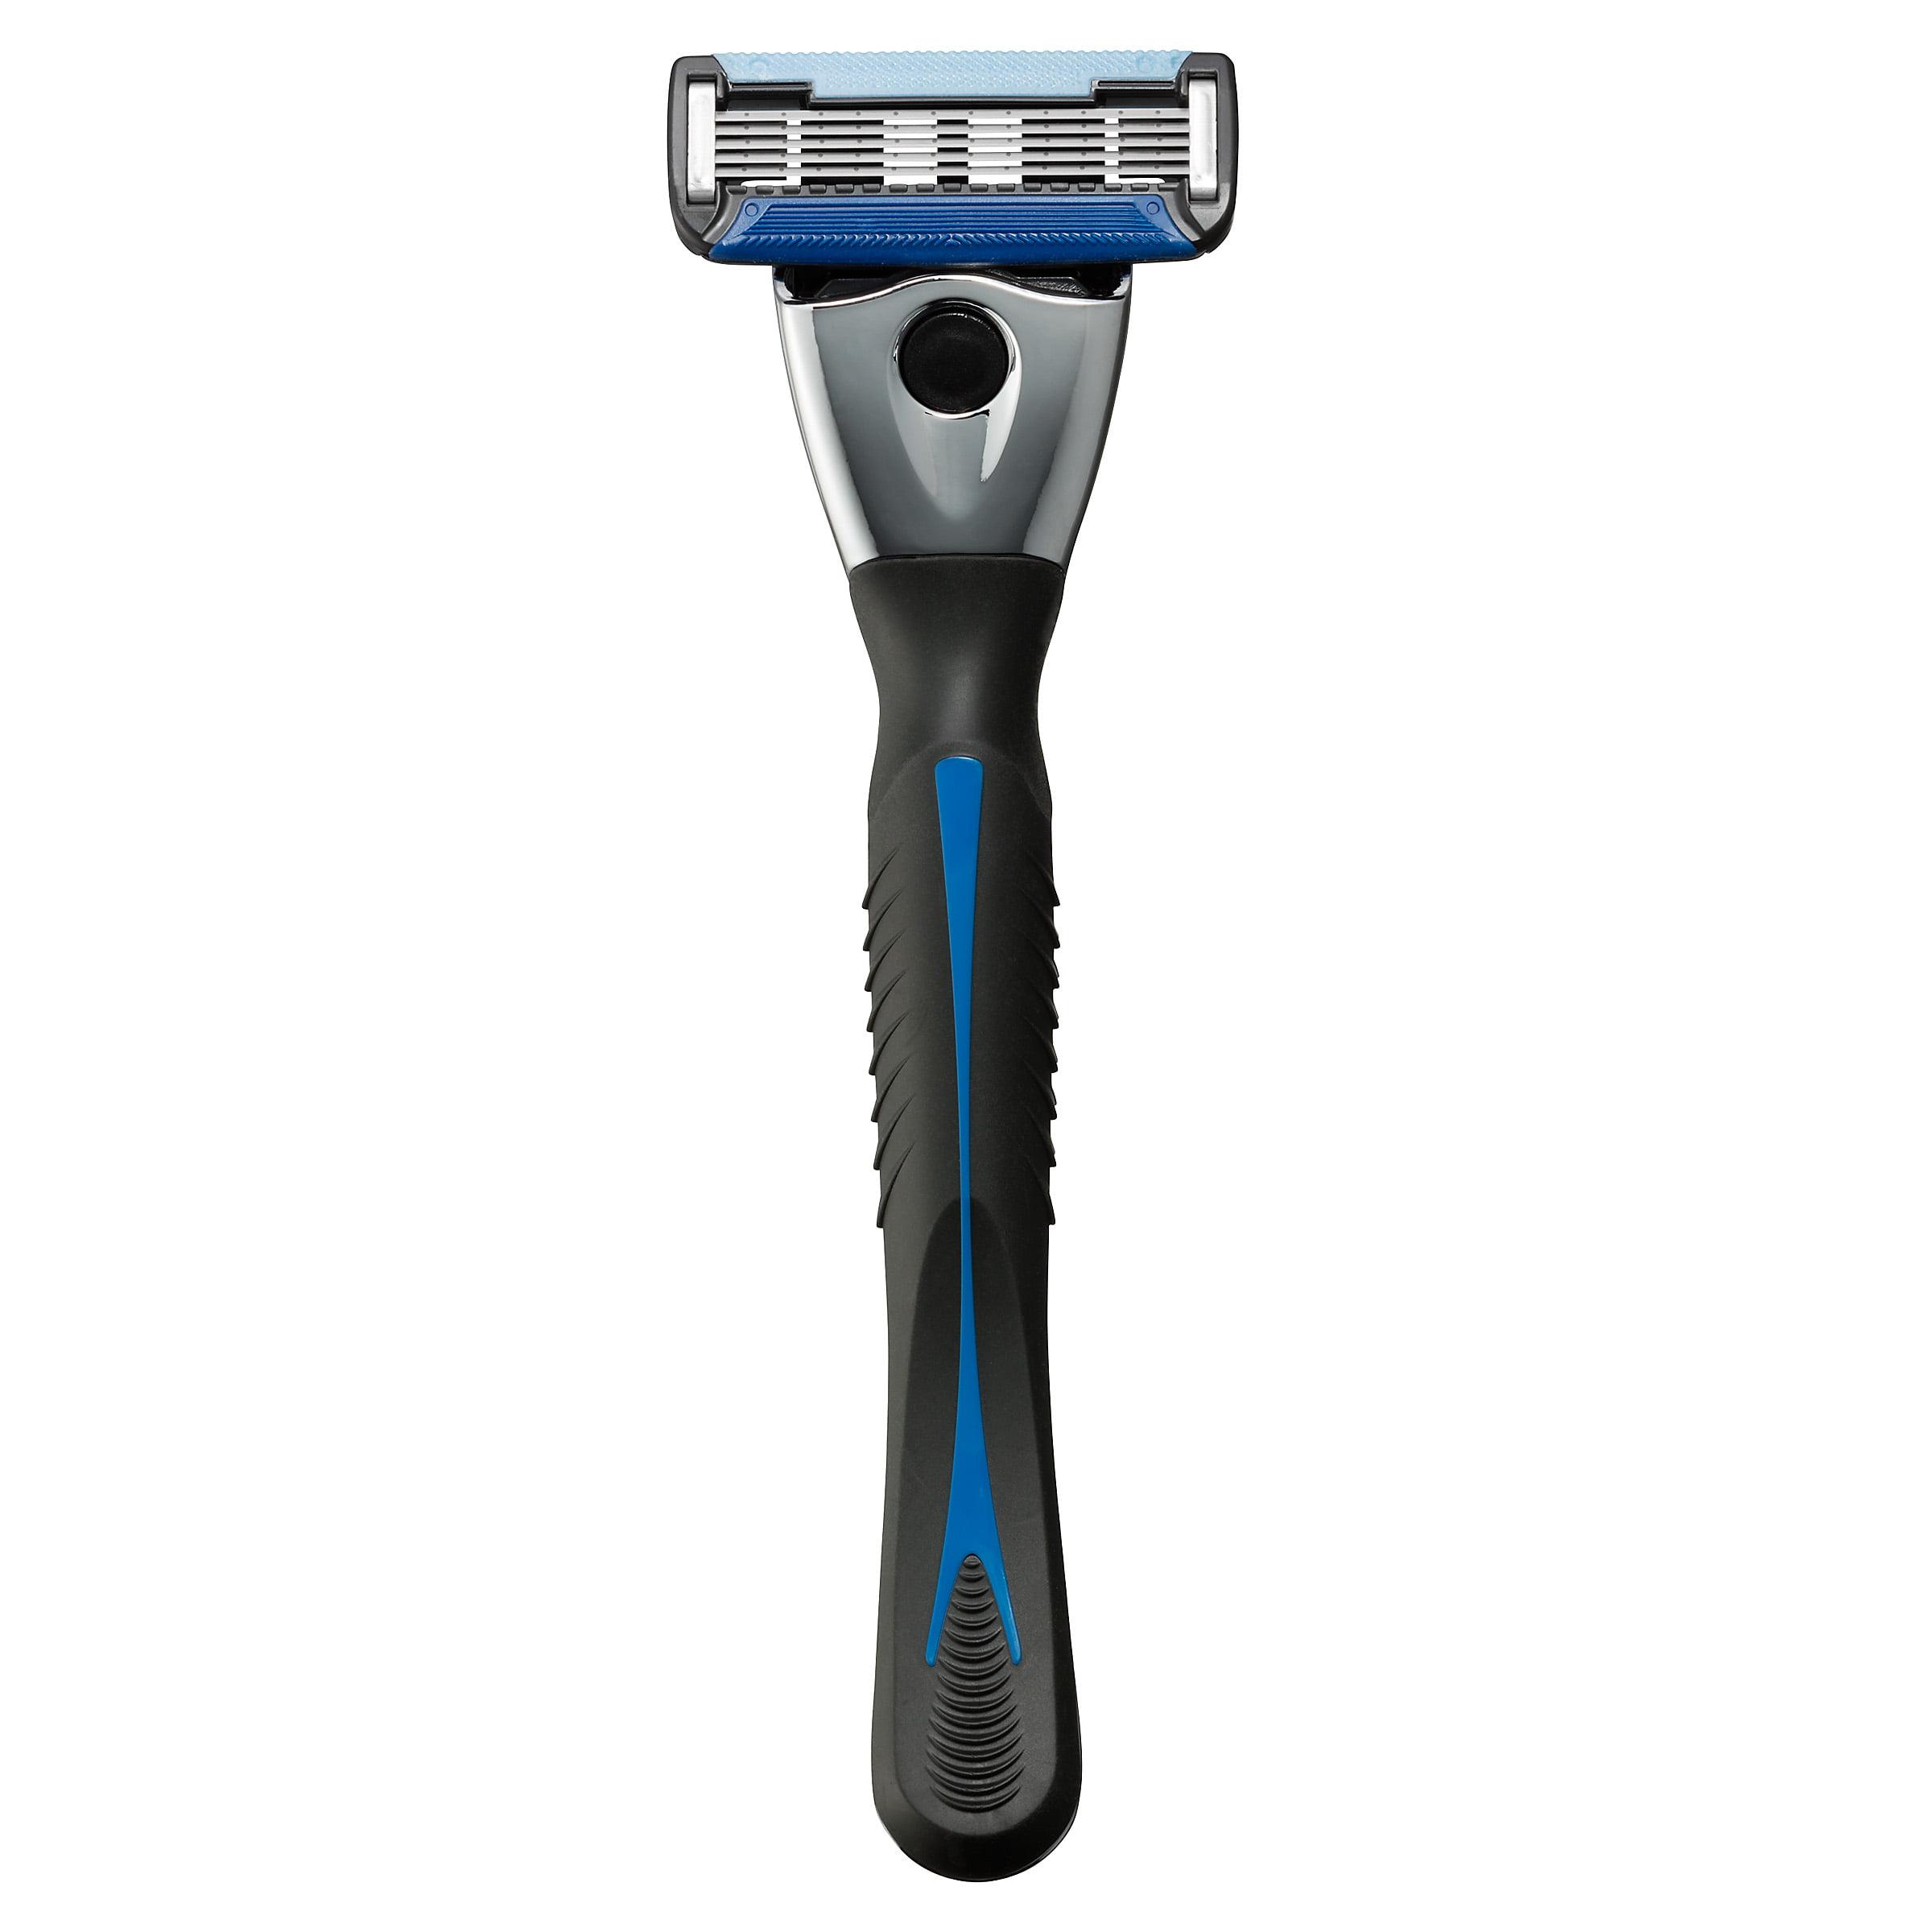 Blade 5 razor